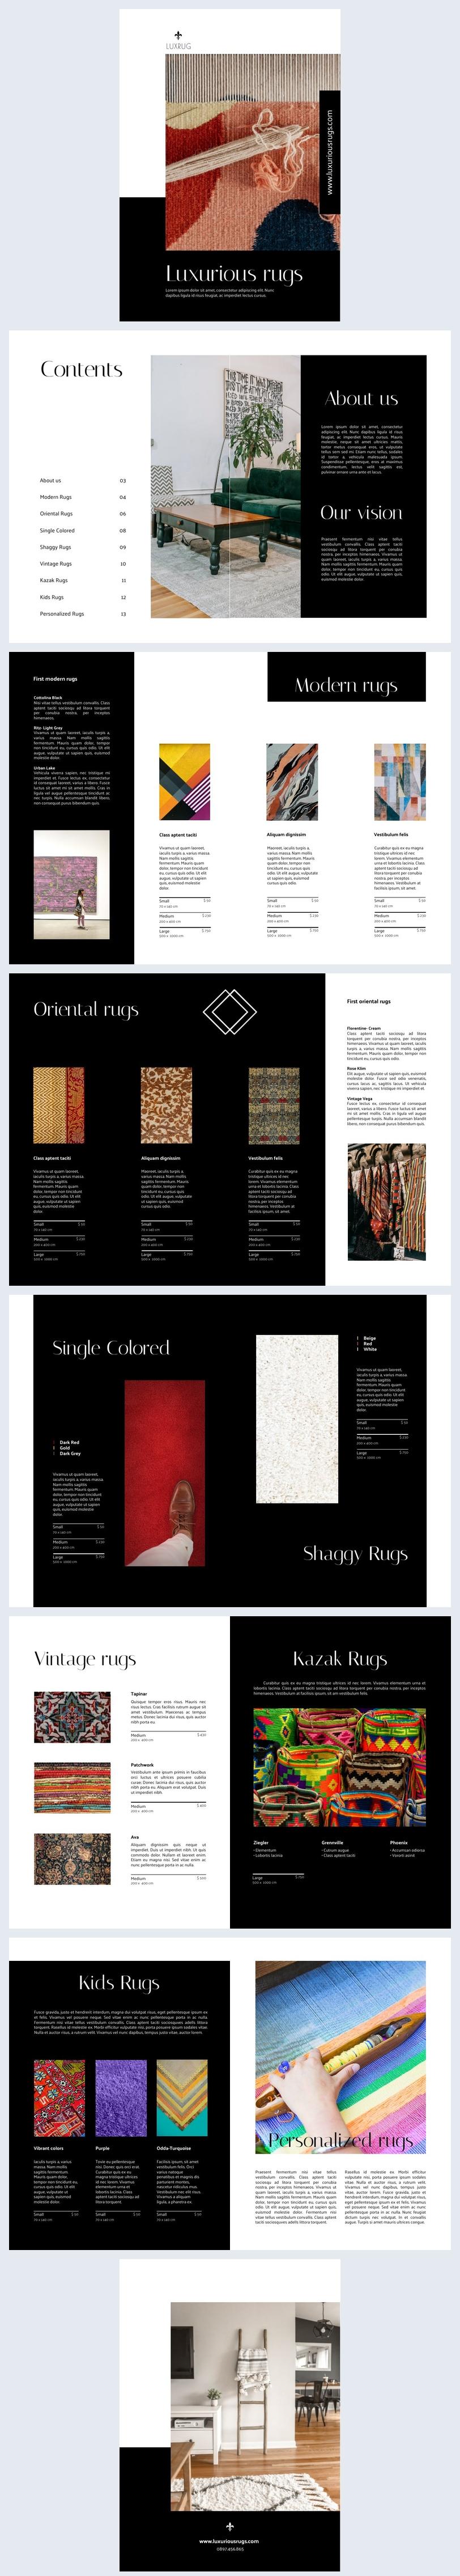 Product Catalog Layout Design Example